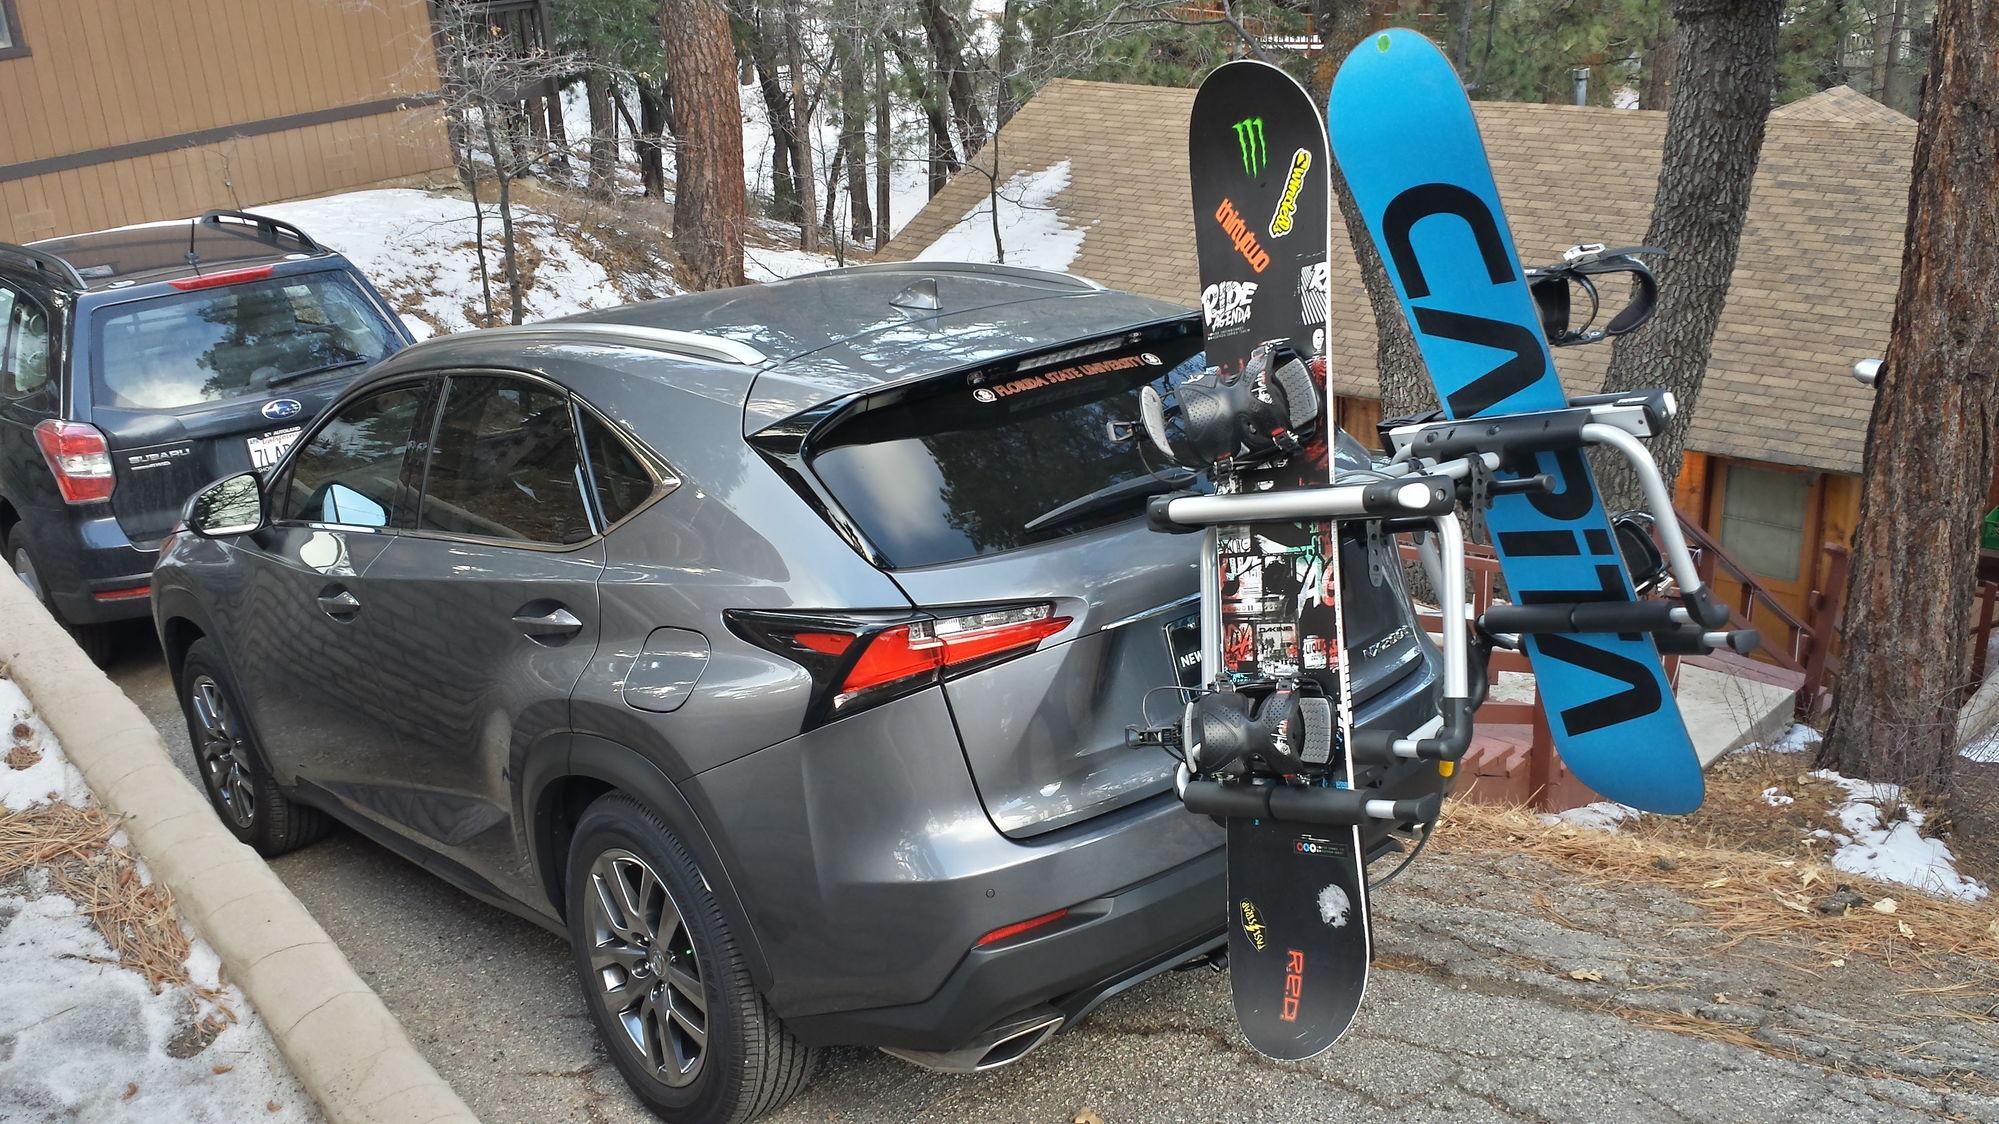 Diy bicycle snowboard ski racks w photos club lexus for Thule 1254